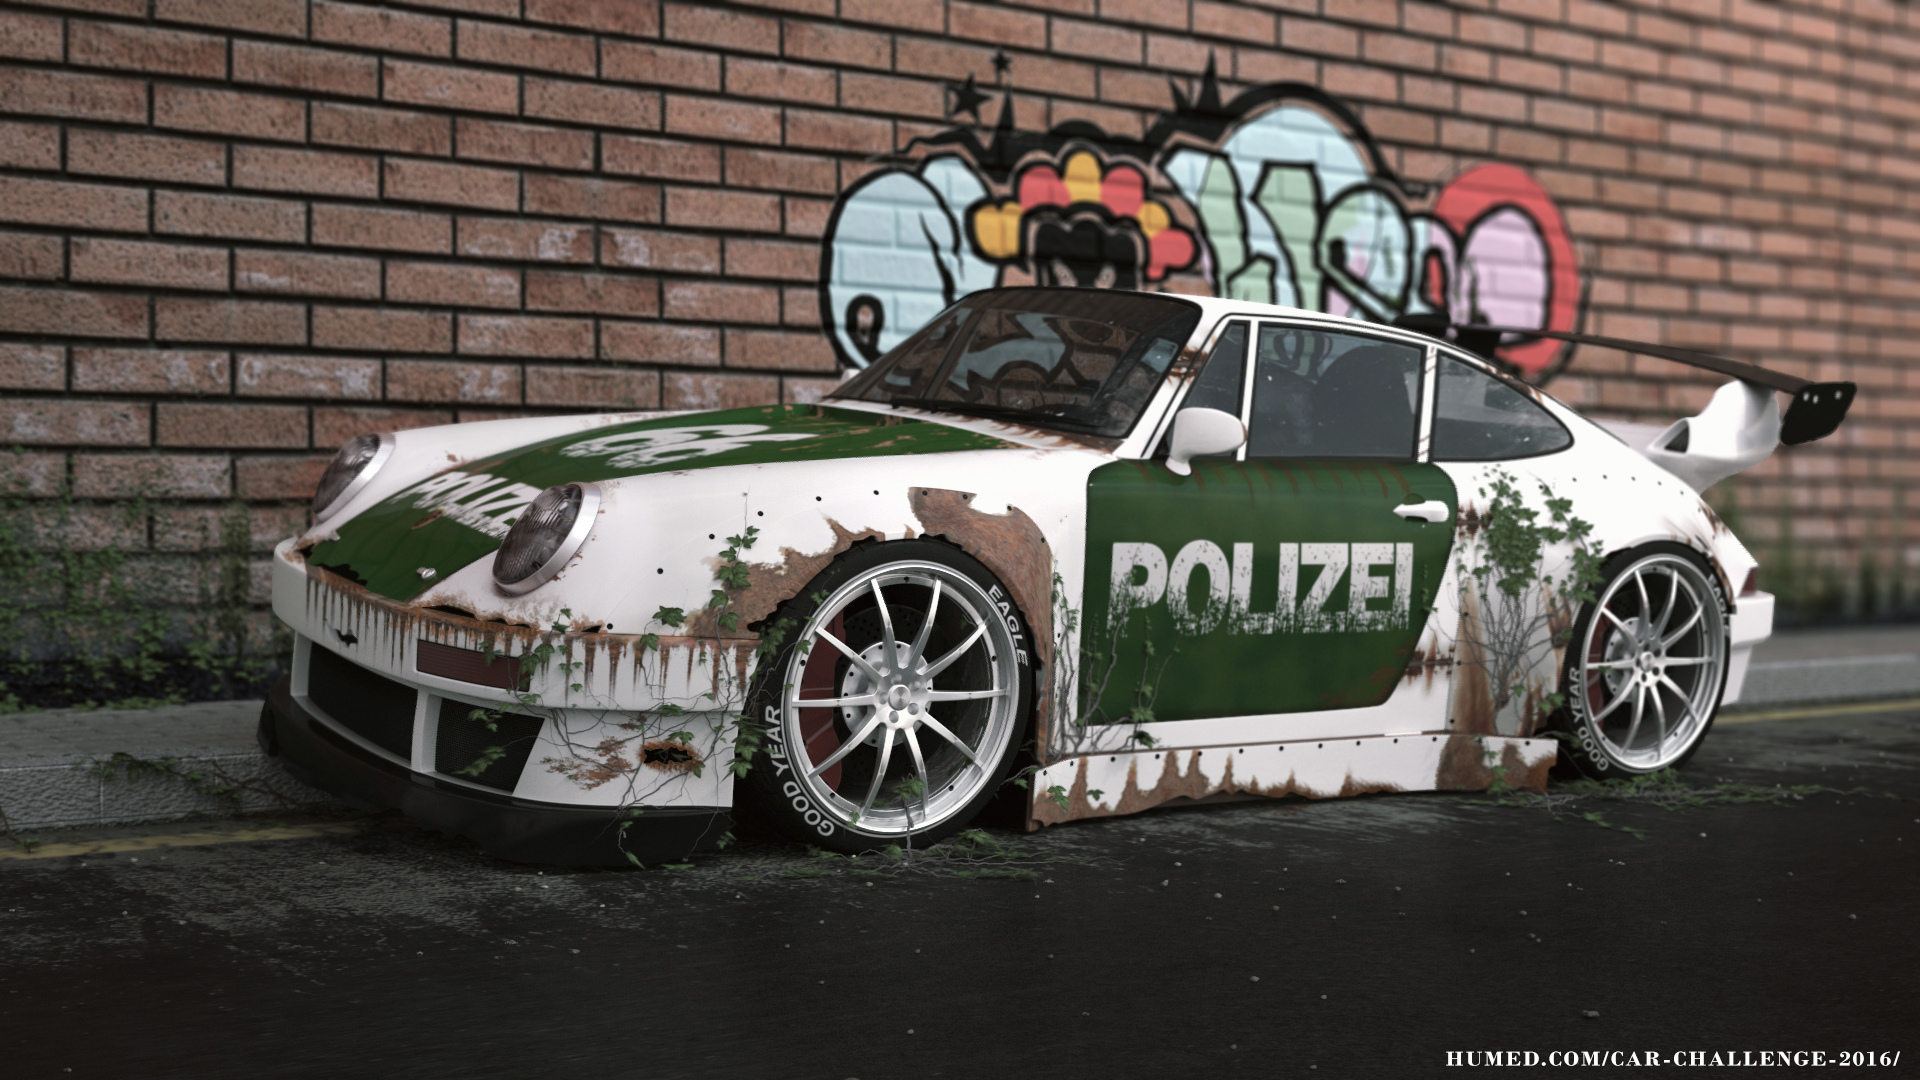 Old police Porsche 993 tuning 3d art